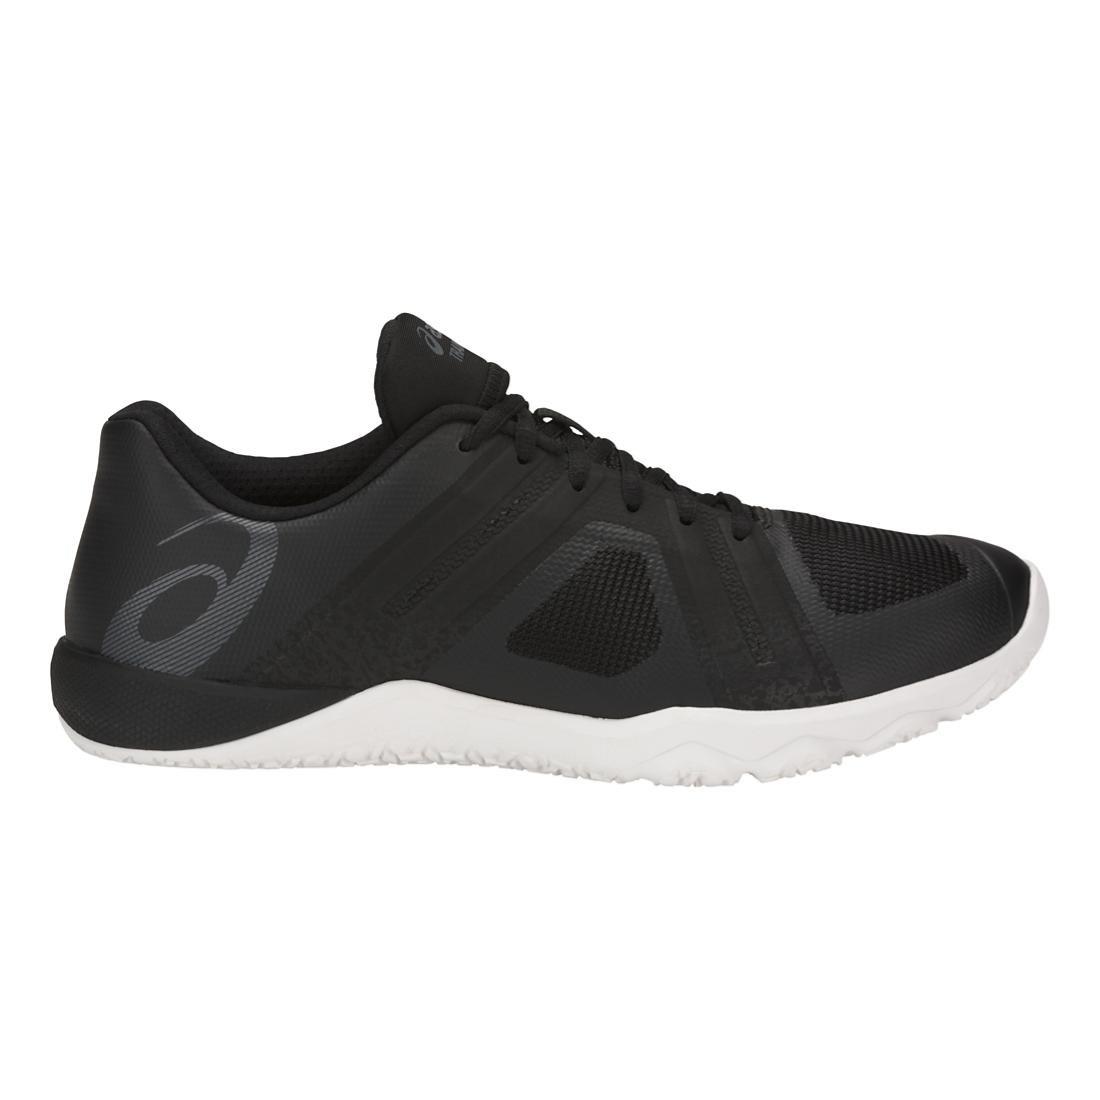 ASICS Women's Conviction X 2 Running Shoe B0725NR62C 6 B(M) US Black/Carbon/Flash Coral